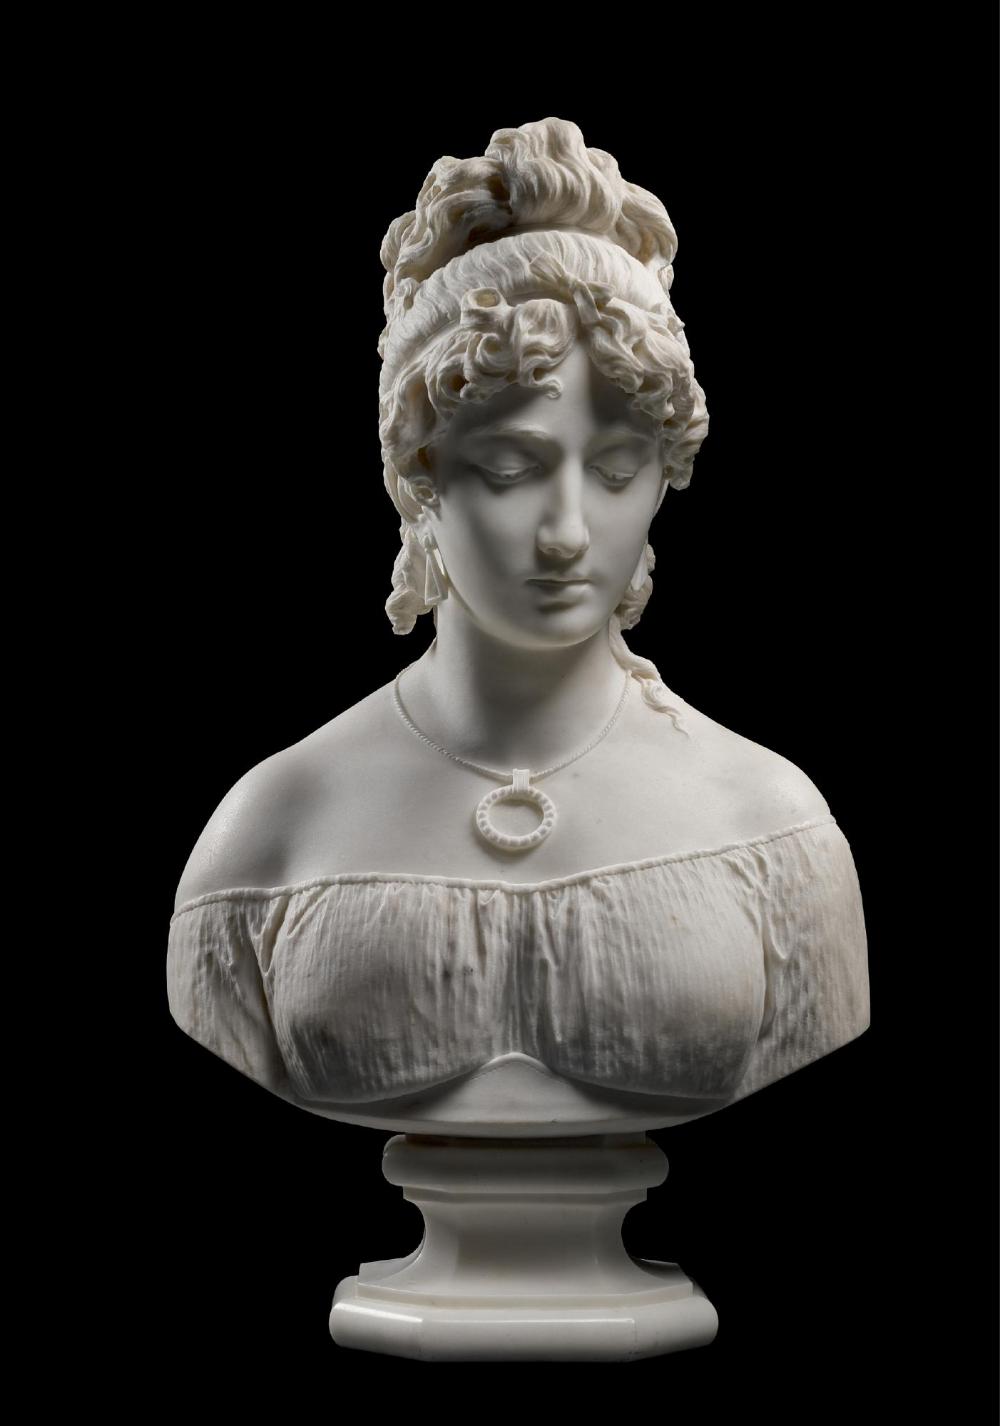 19th And 20th Century Sculpture Place Bid Roman Sculpture Bust Sculpture Portrait Sculpture